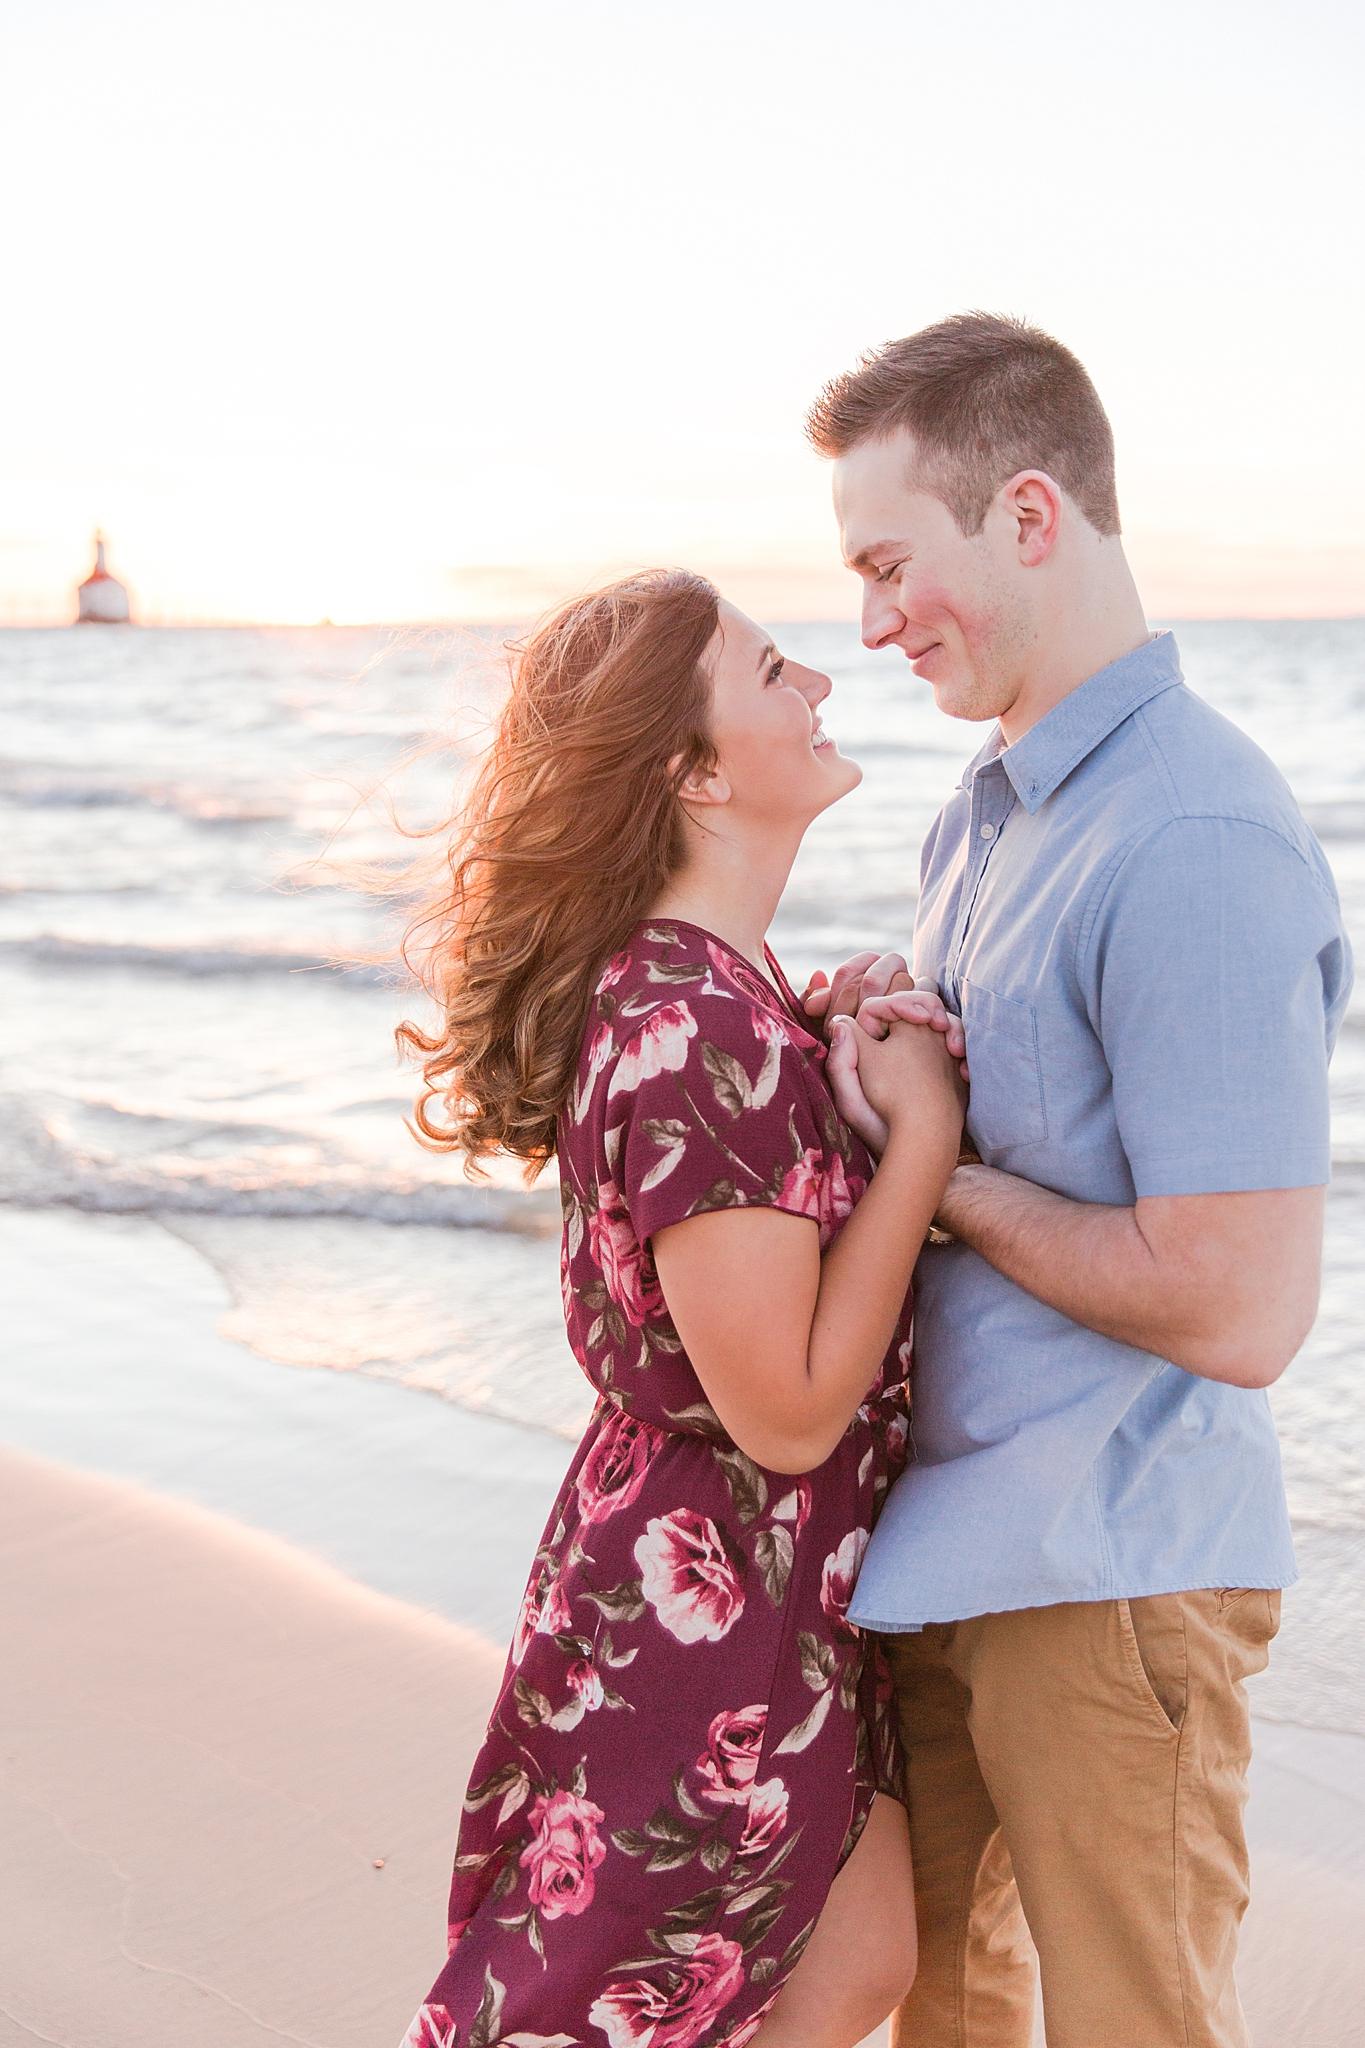 romantic--summer-beach-engagement-photography-in-st-joseph-mi-by-courtney-carolyn-photography_0011.jpg